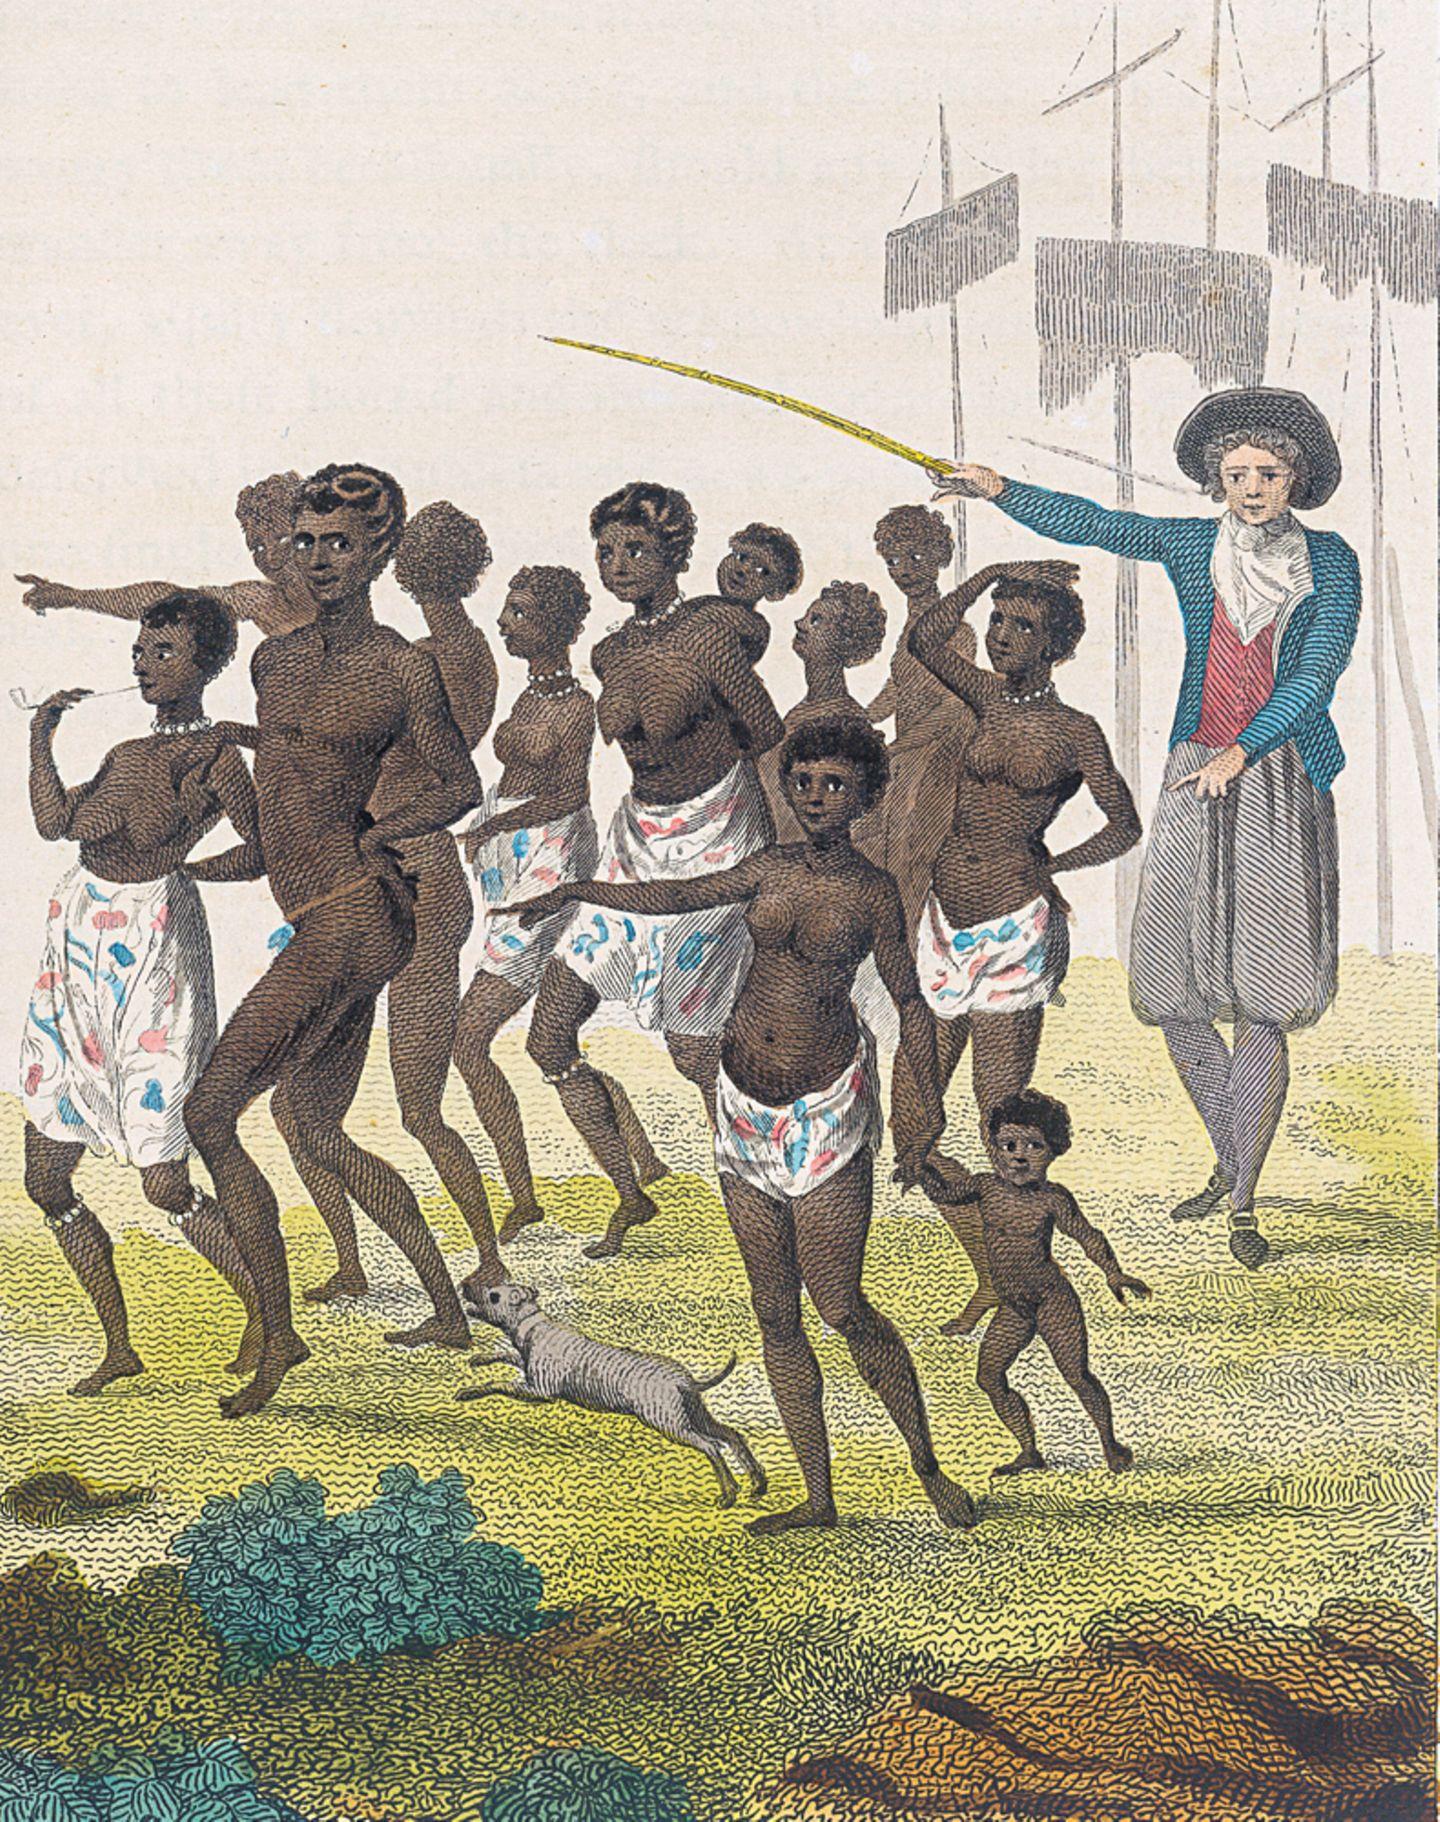 Kolonialverbrechen